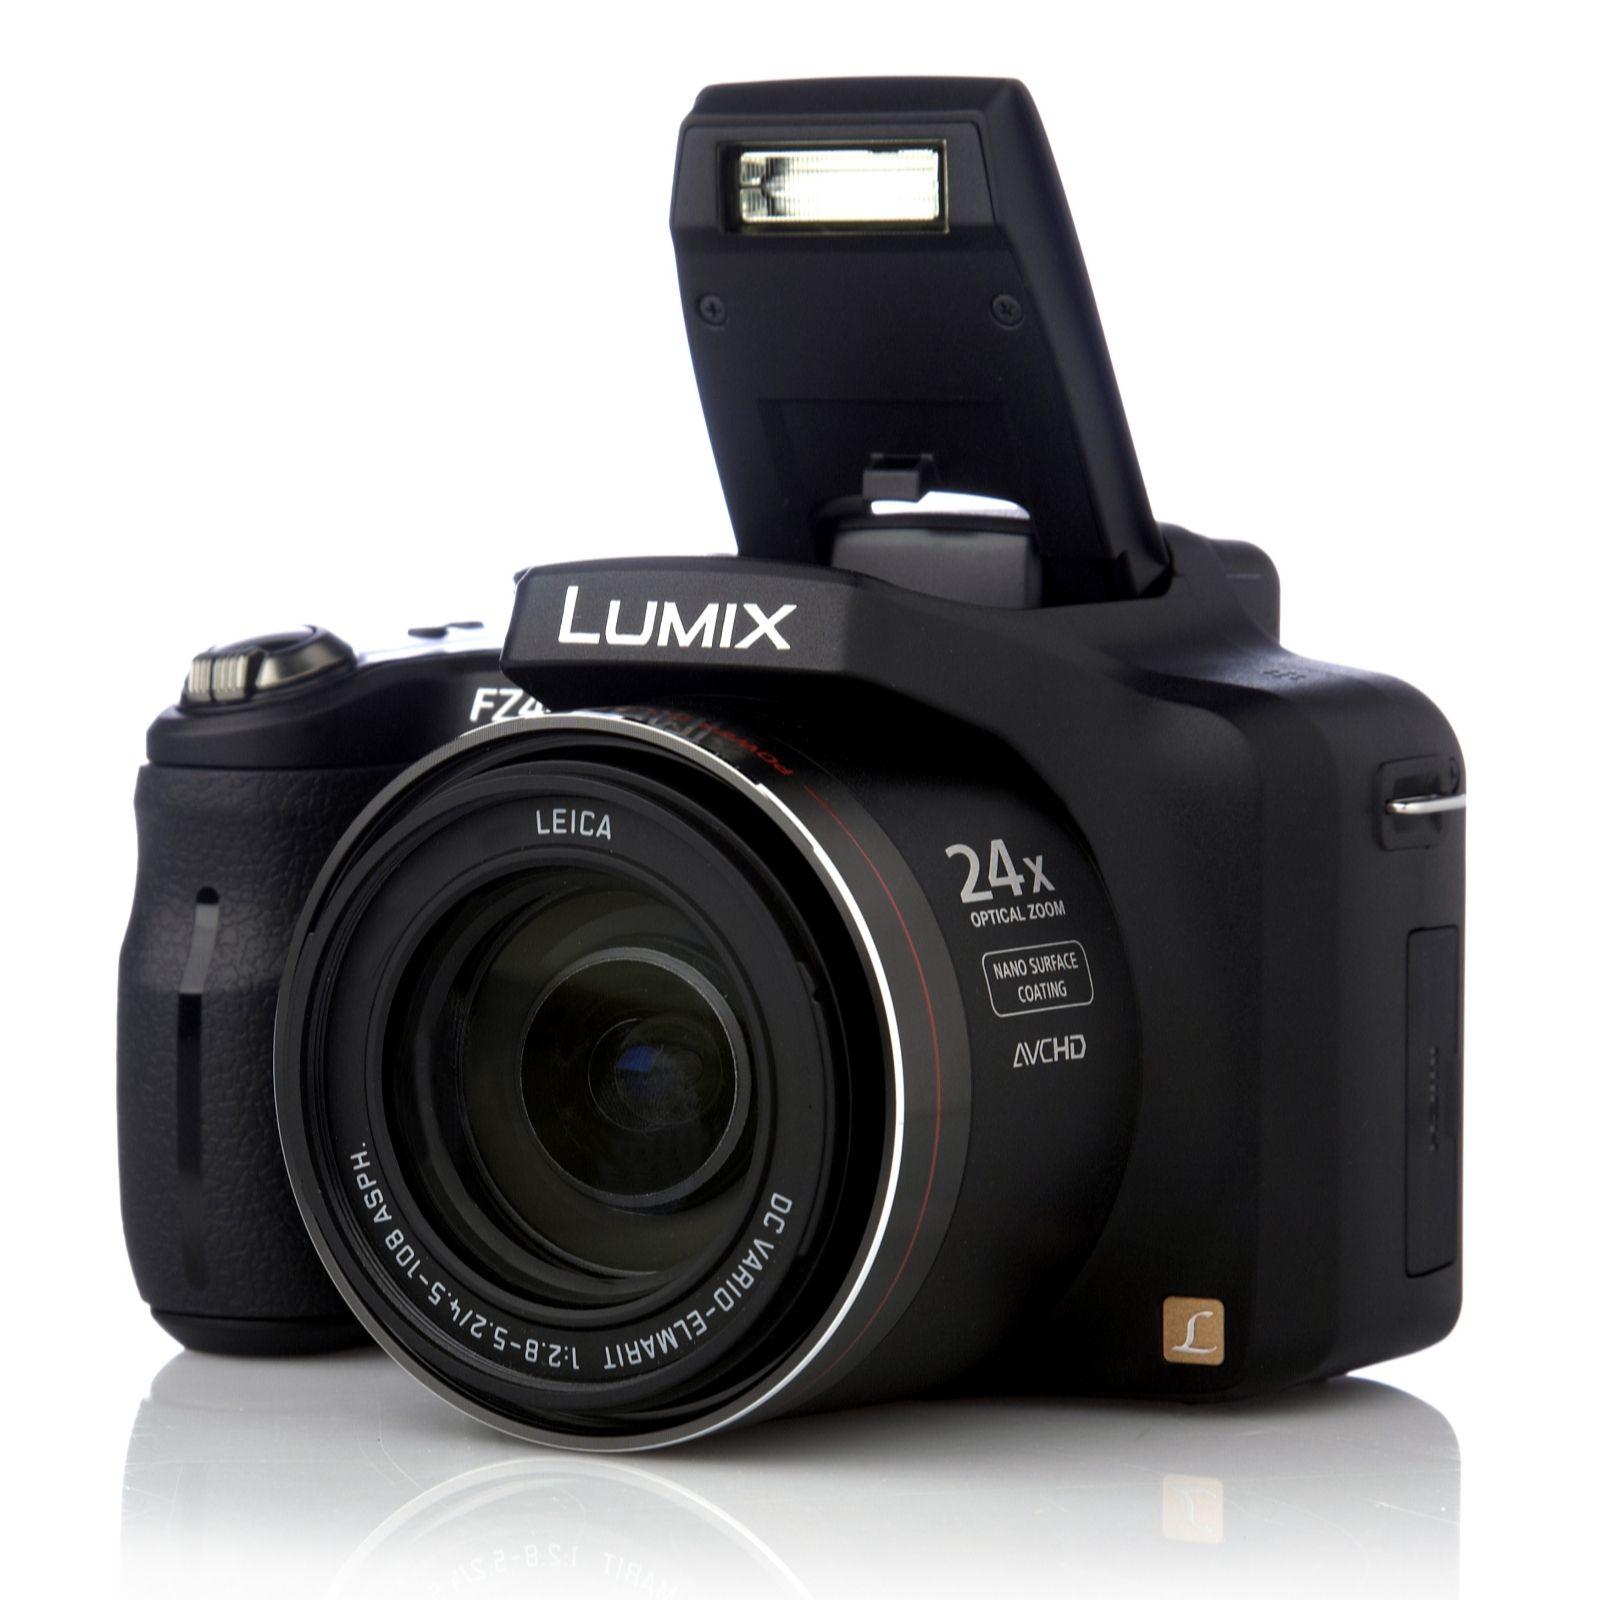 panasonic lumix fz48 12mp bridge camera 24x opt zoom hd video 4gb rh qvcuk com lumix fz48 user guide Instruction Manual